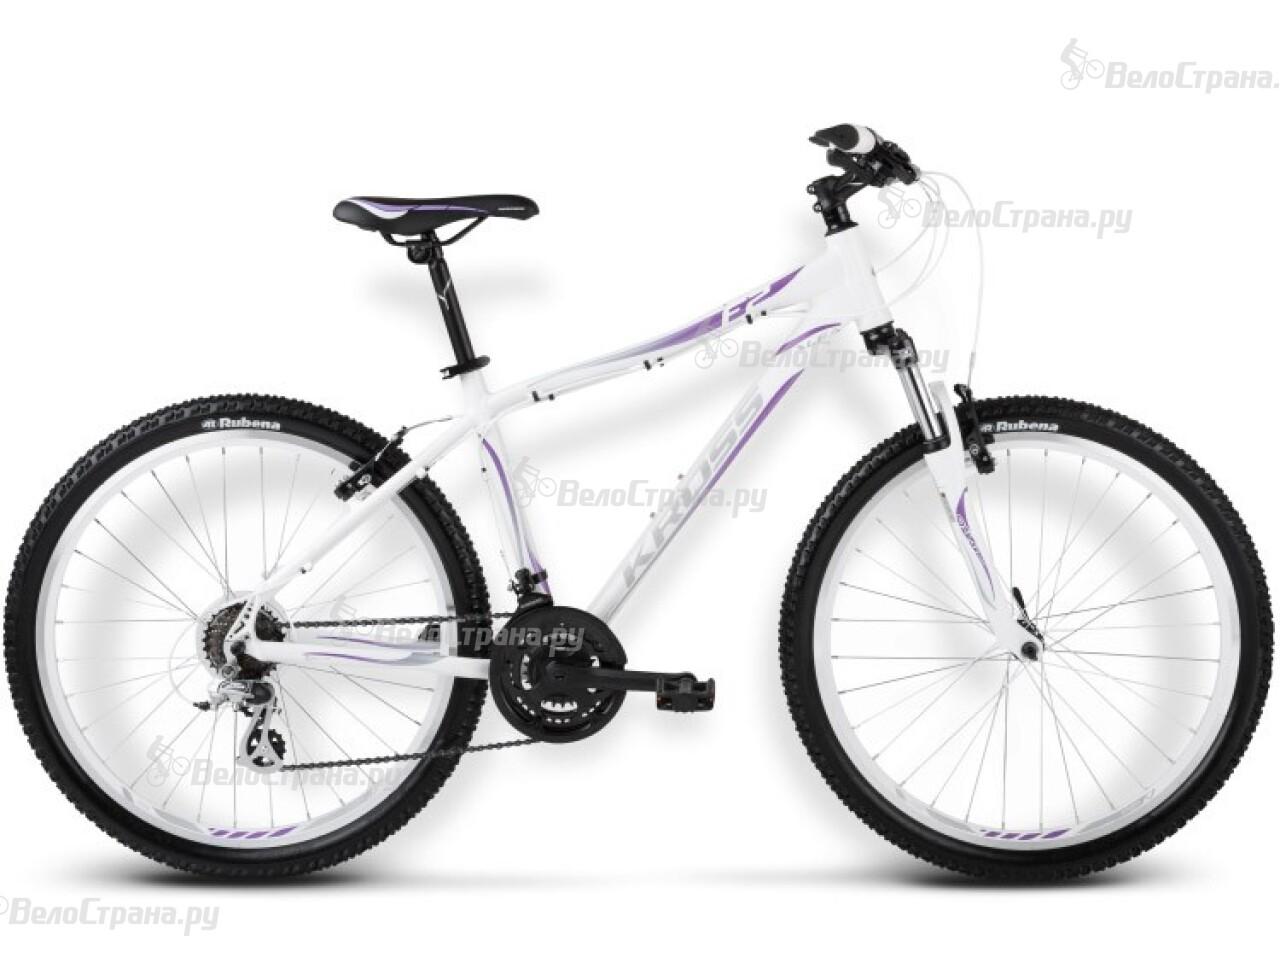 Велосипед Kross Lea F2 (2015) цены онлайн